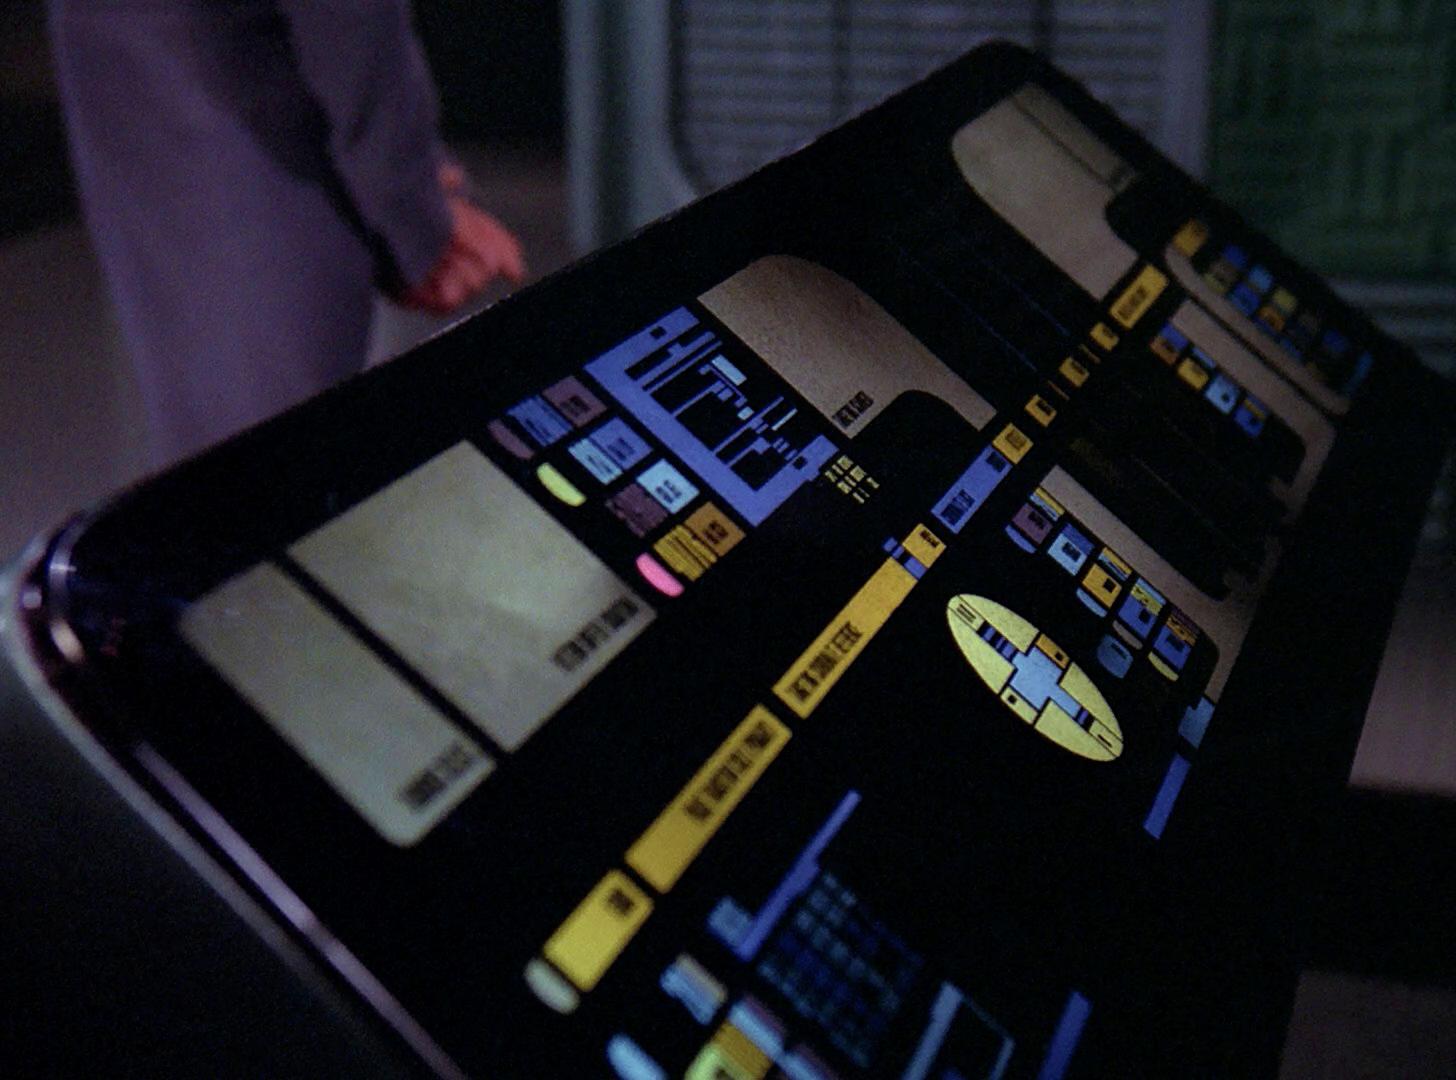 Image galaxy transporter memory alpha fandom powered by wikia - Star trek online console ...